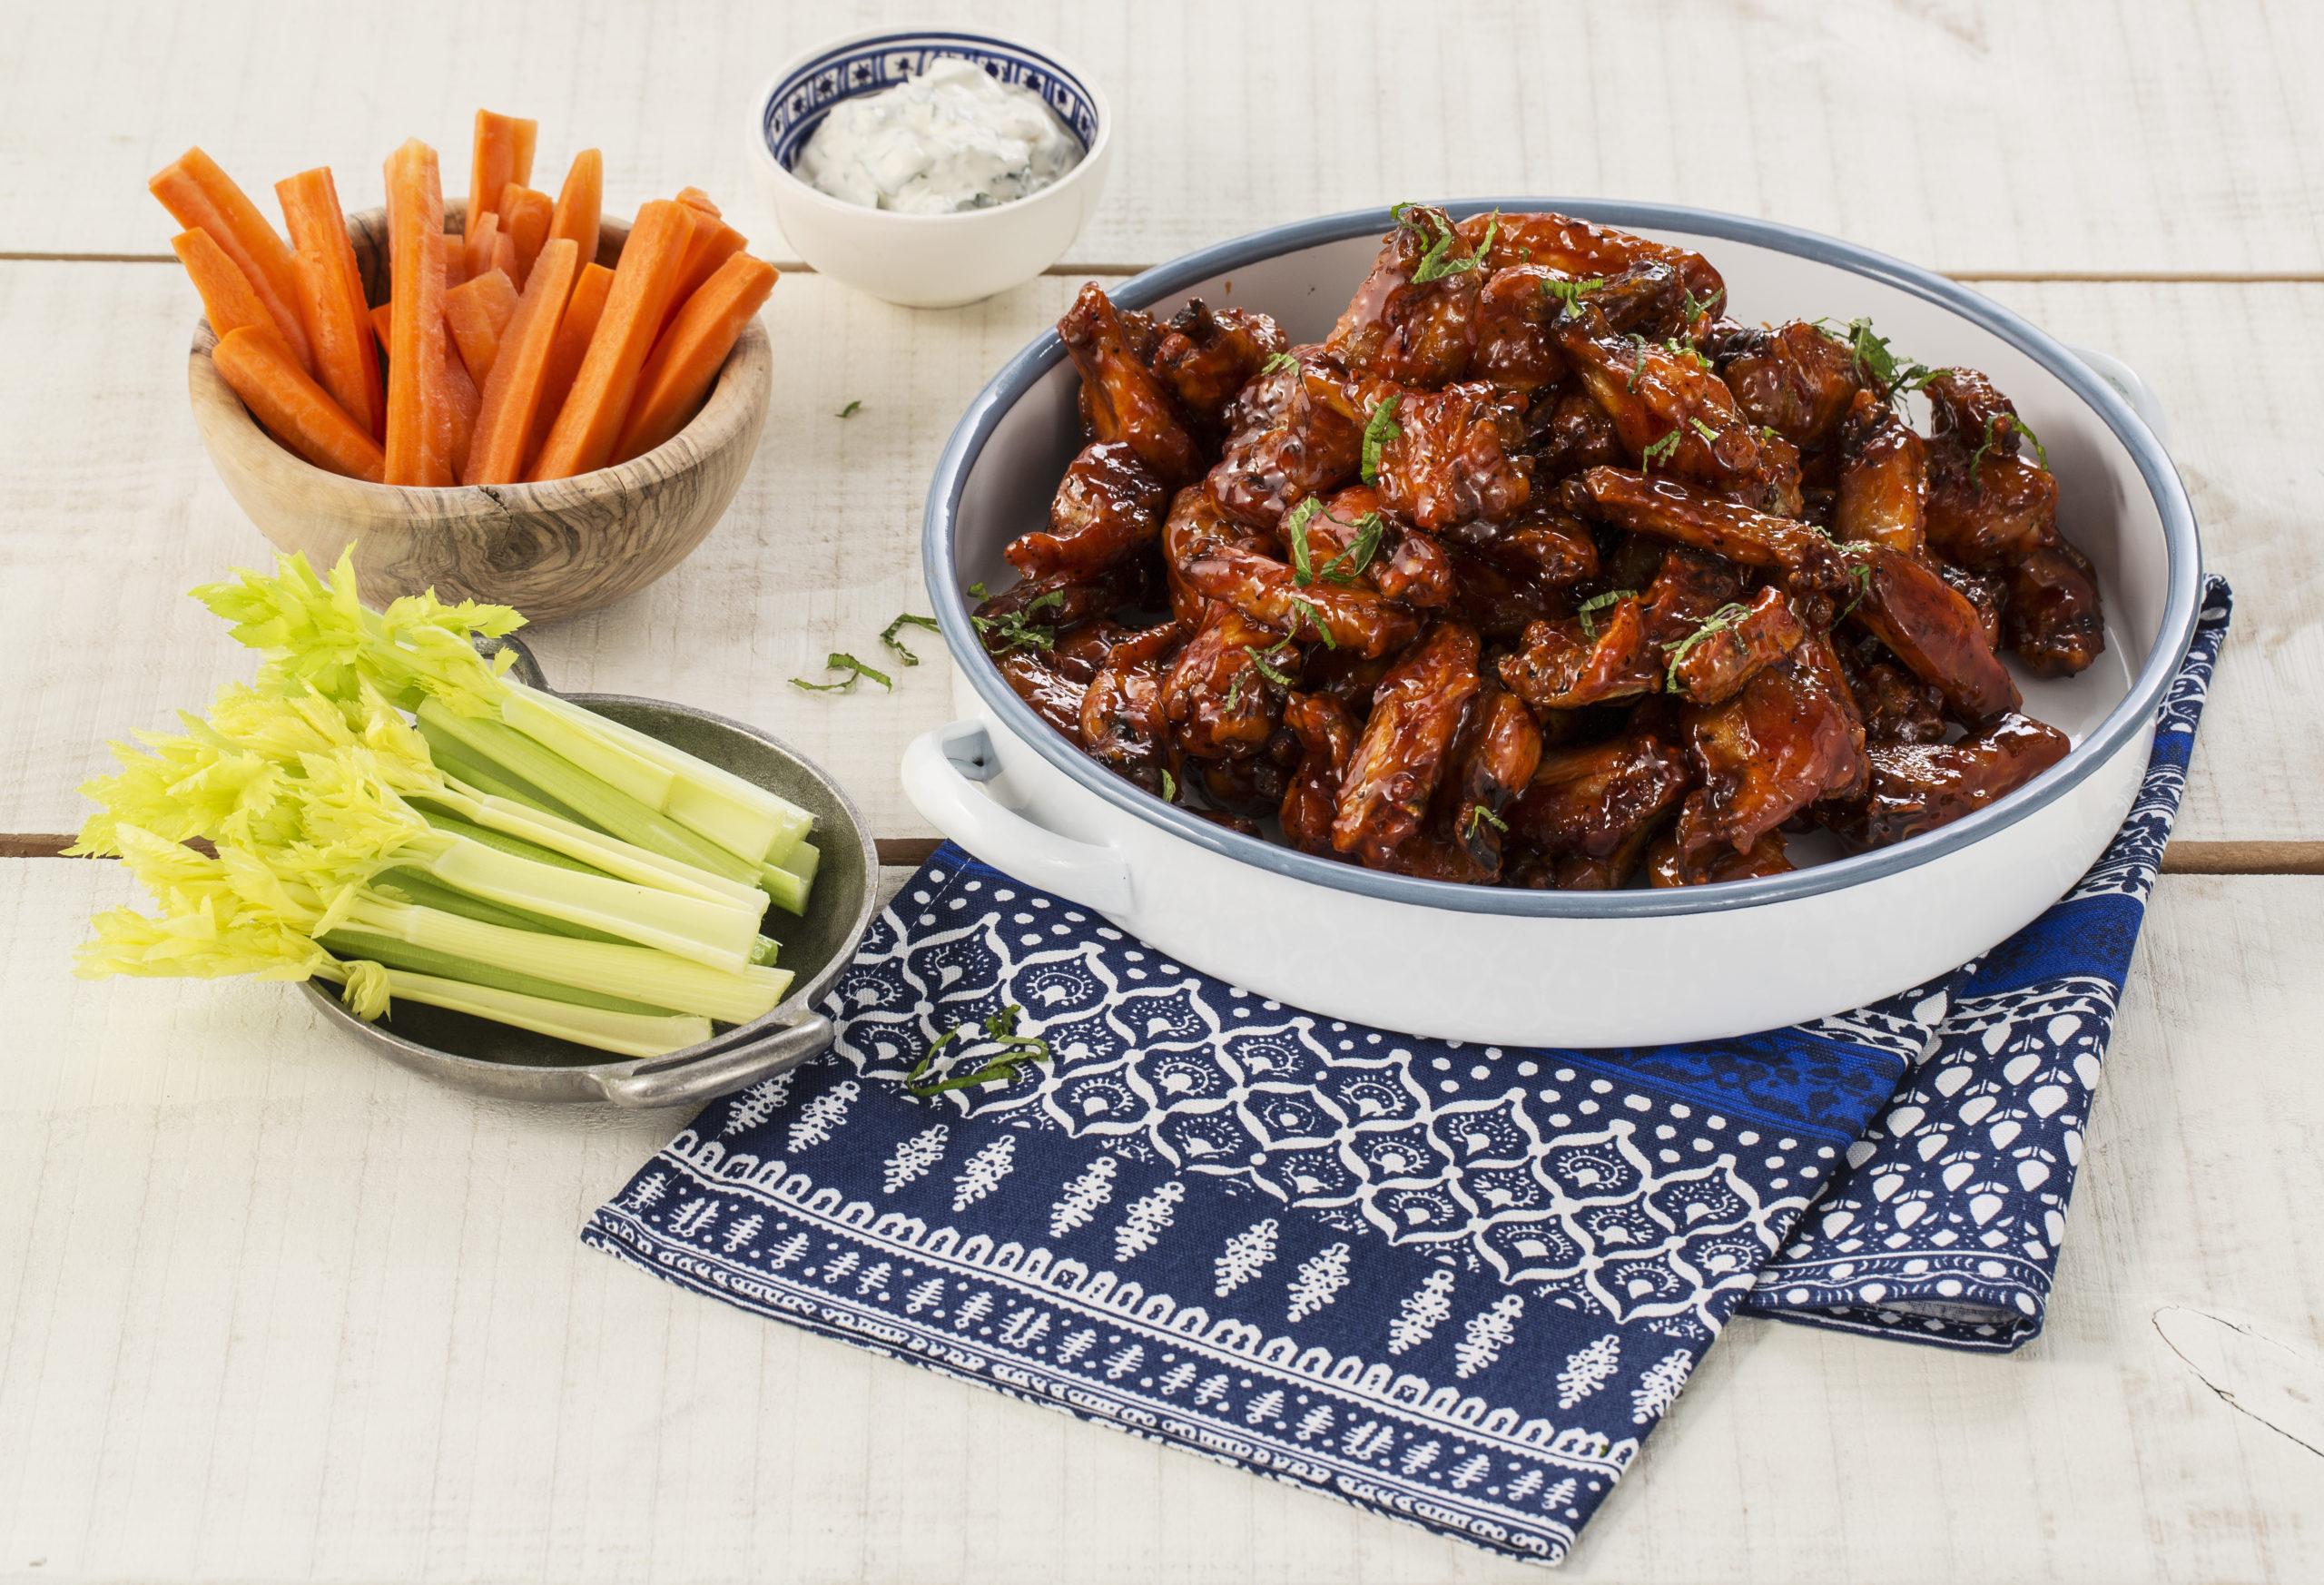 AVOCA's Korean Style Baked Chicken Wings Recipe